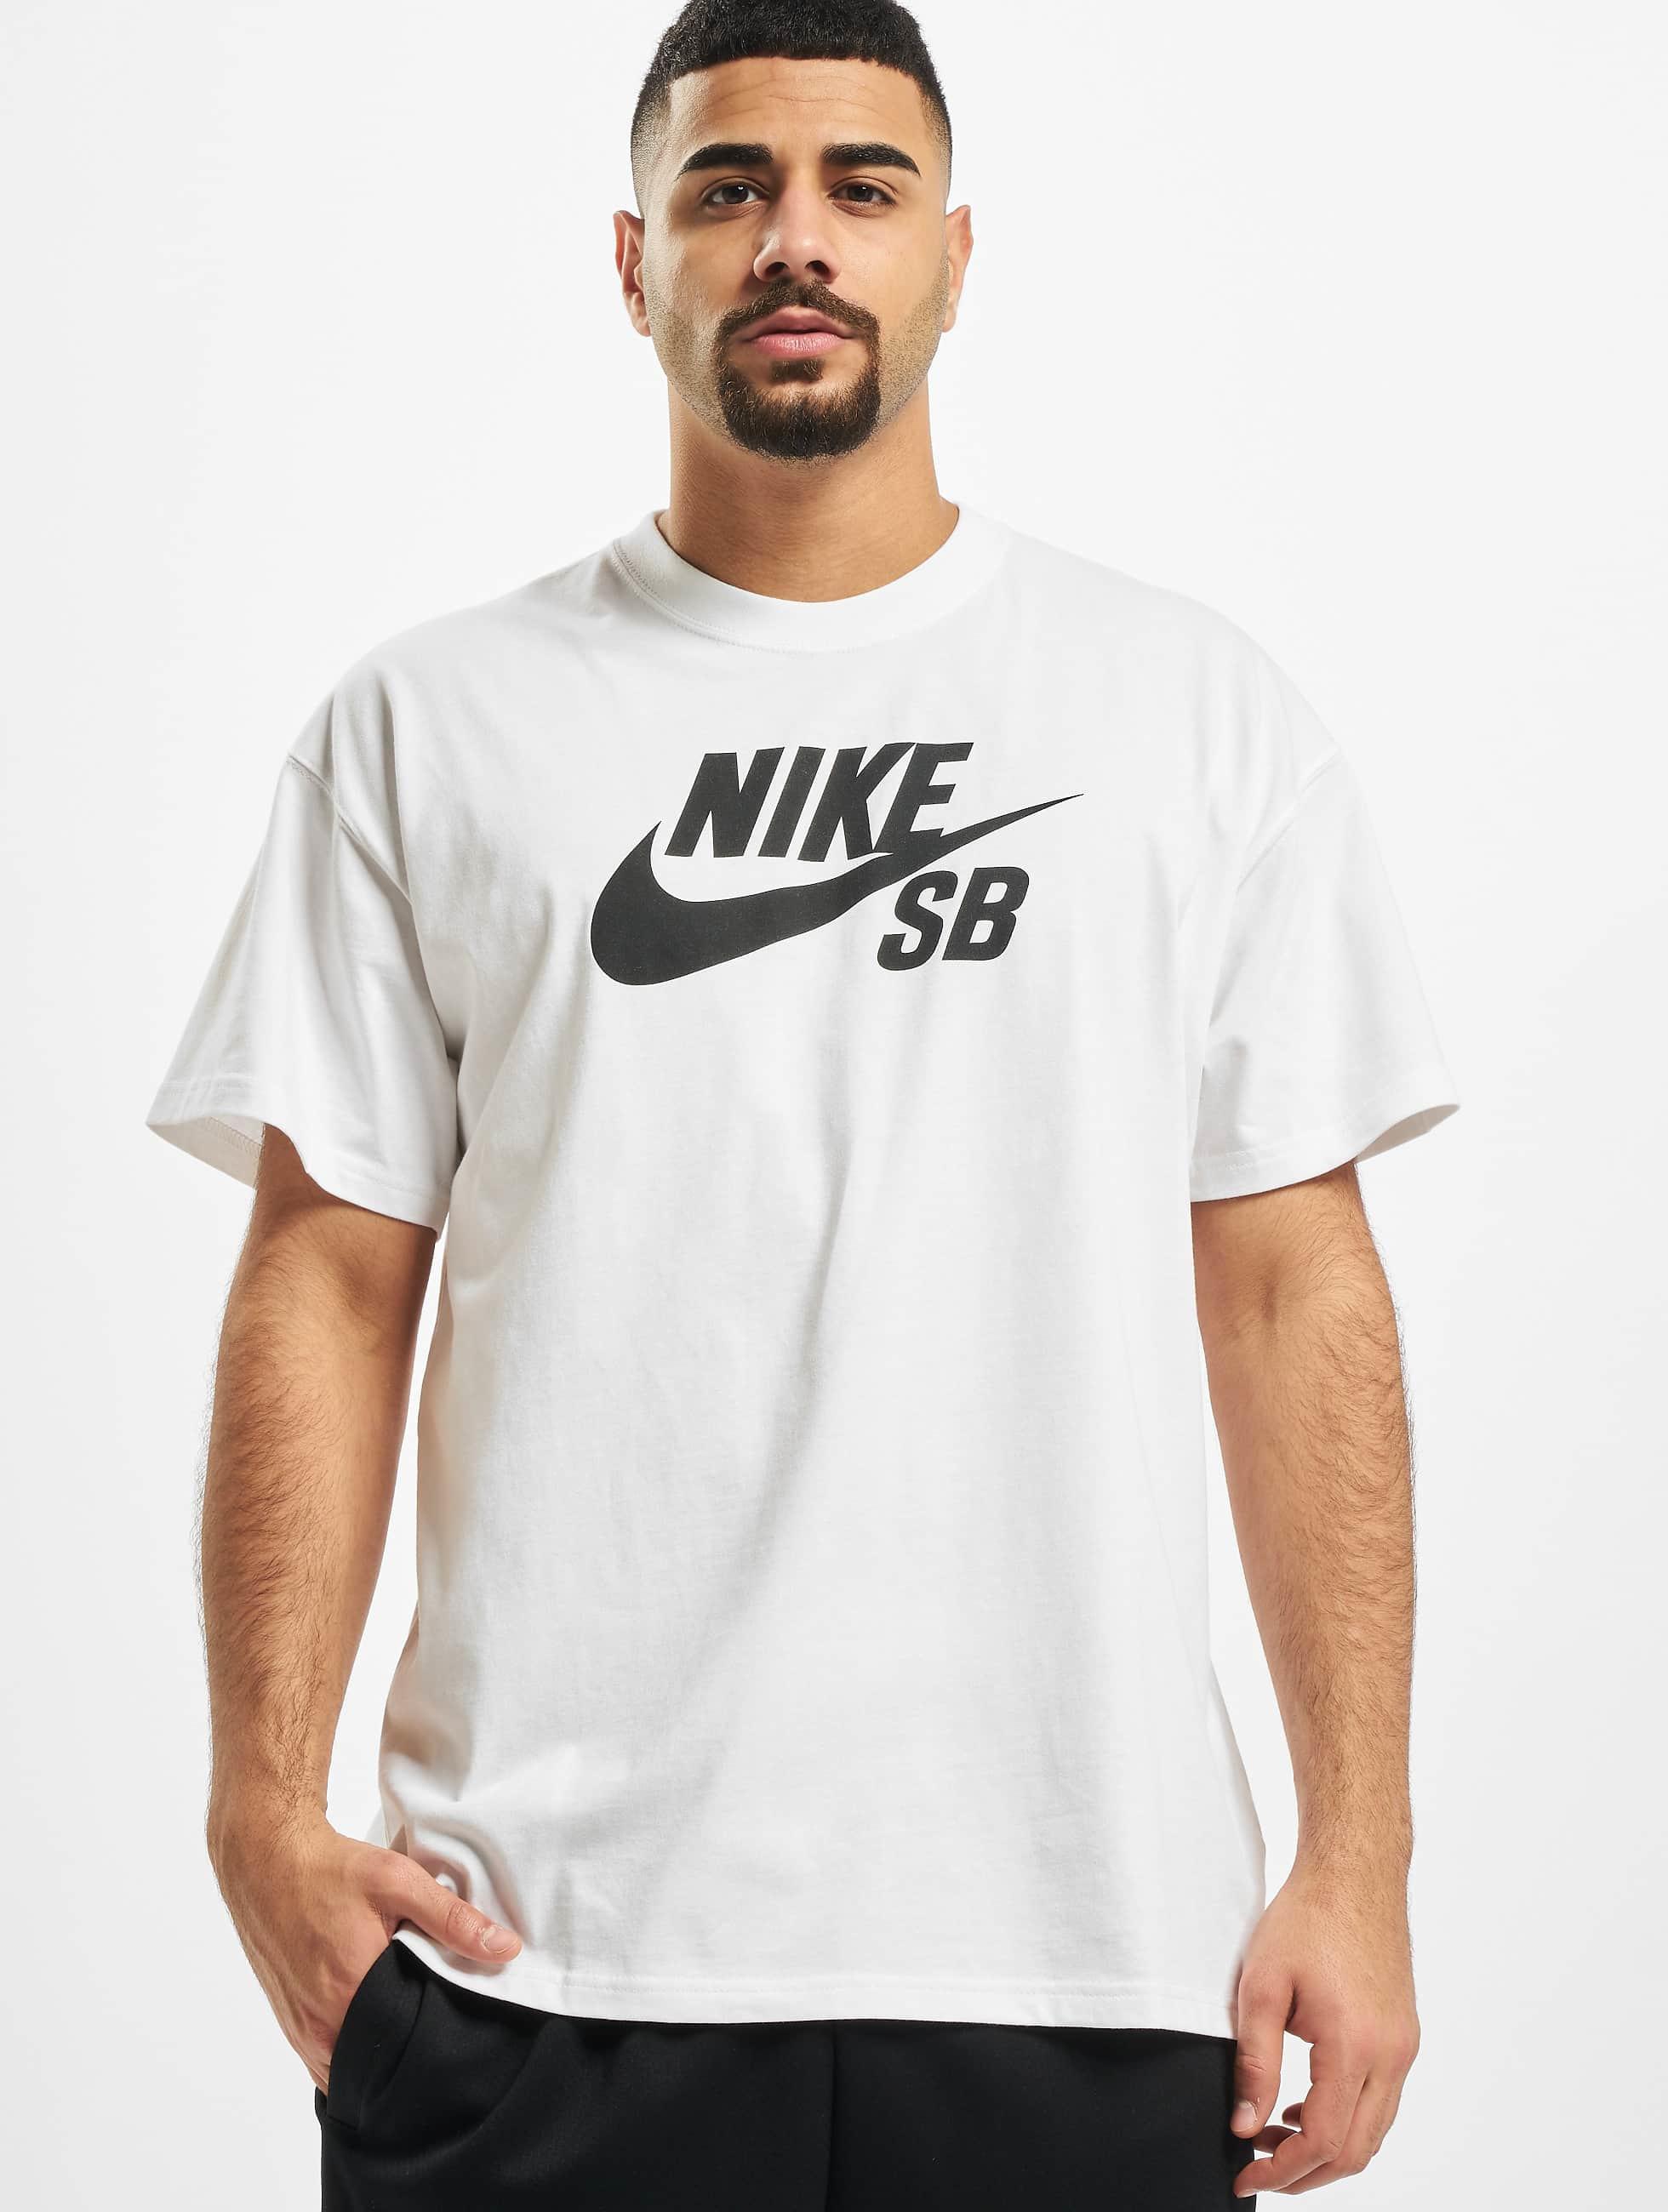 Nike SB Logo T-Shirt White/Black